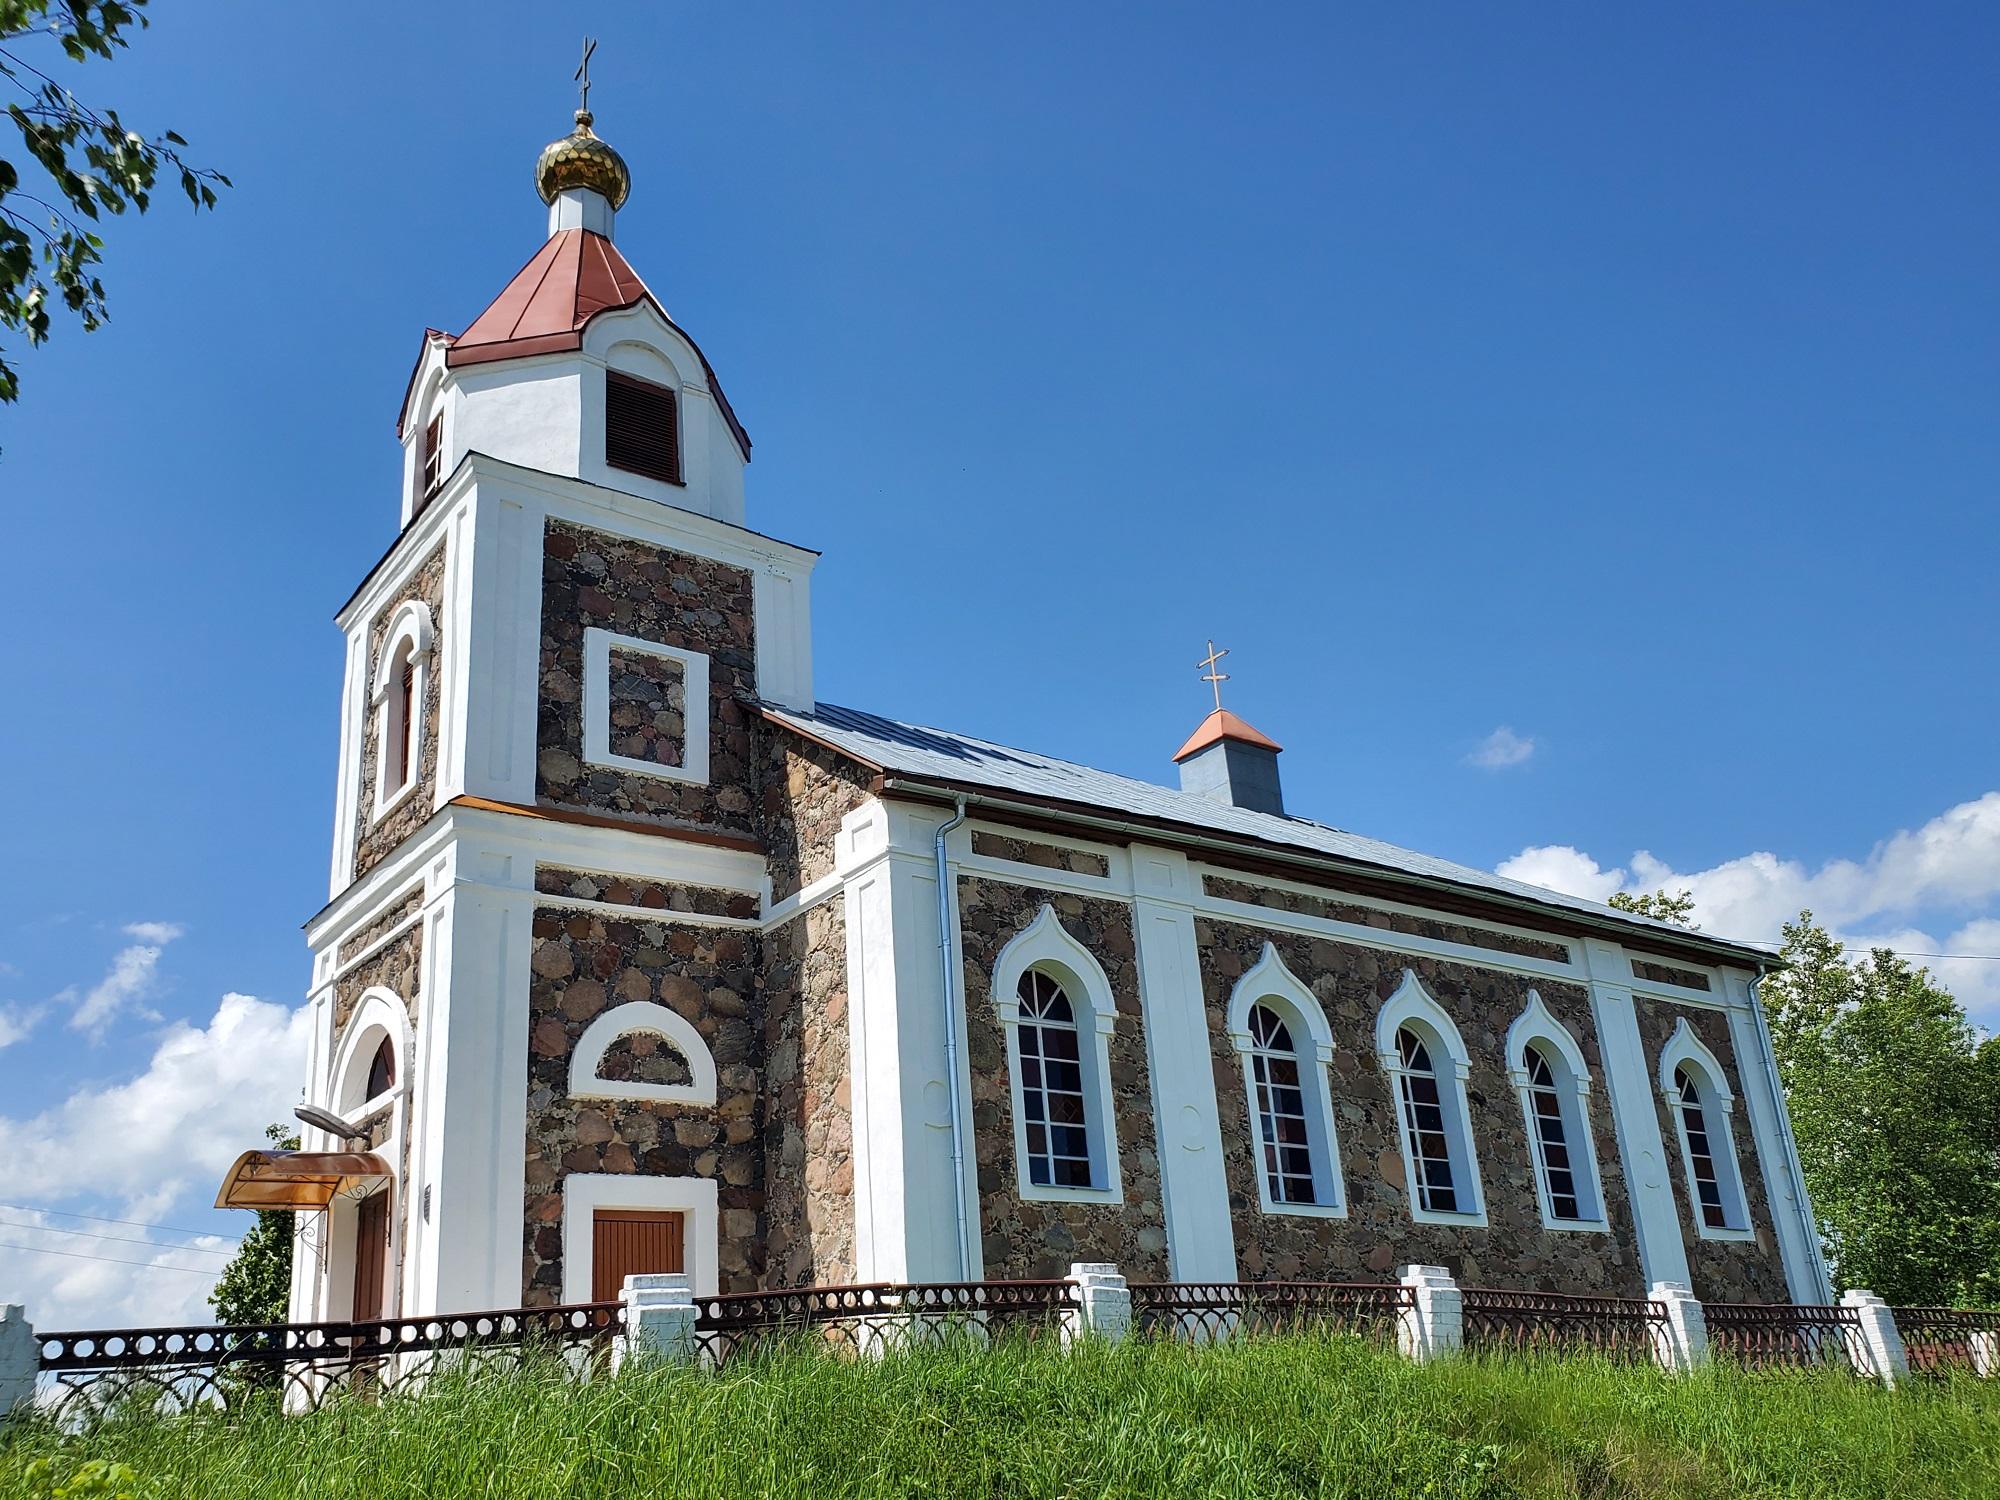 20200606 140836 - Храм Рождества Иоанна Предтечи в деревне Груздово